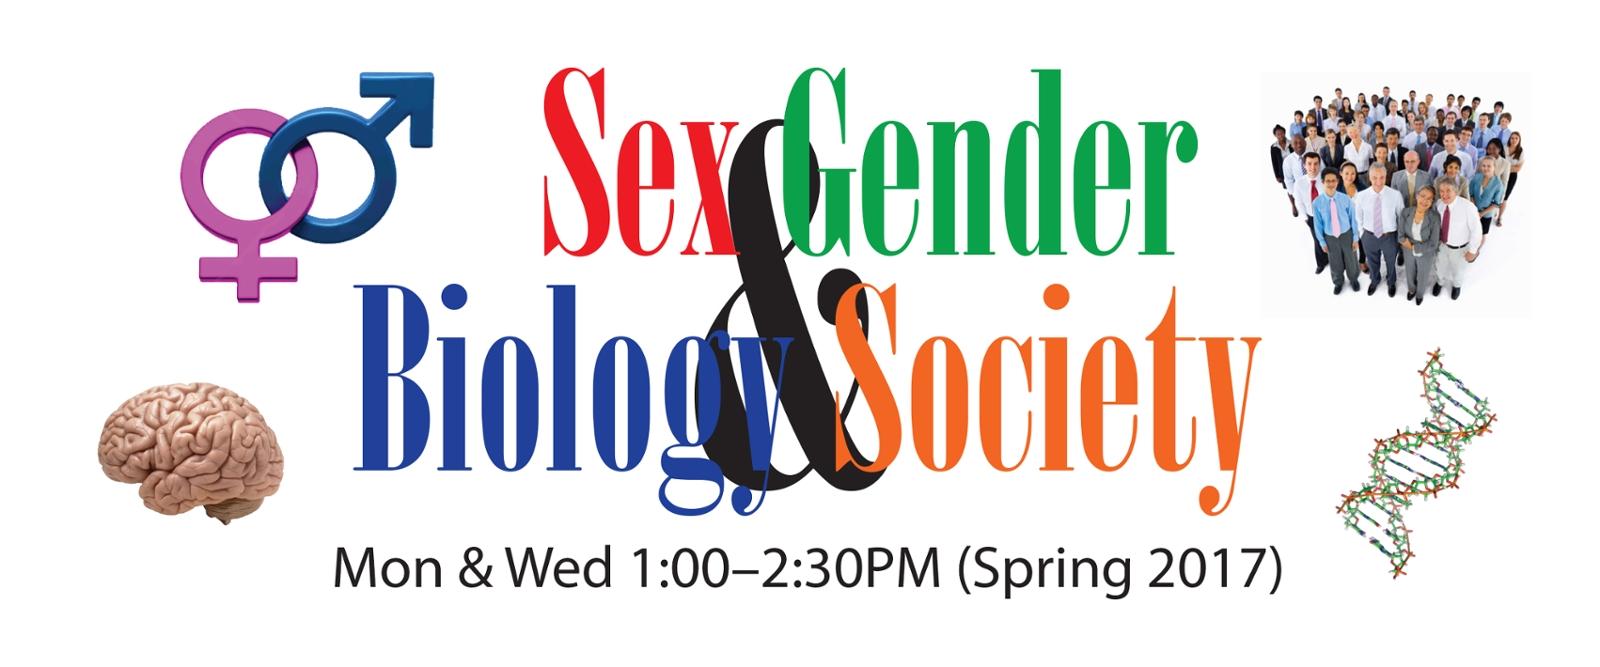 University Of Houston Sex 21